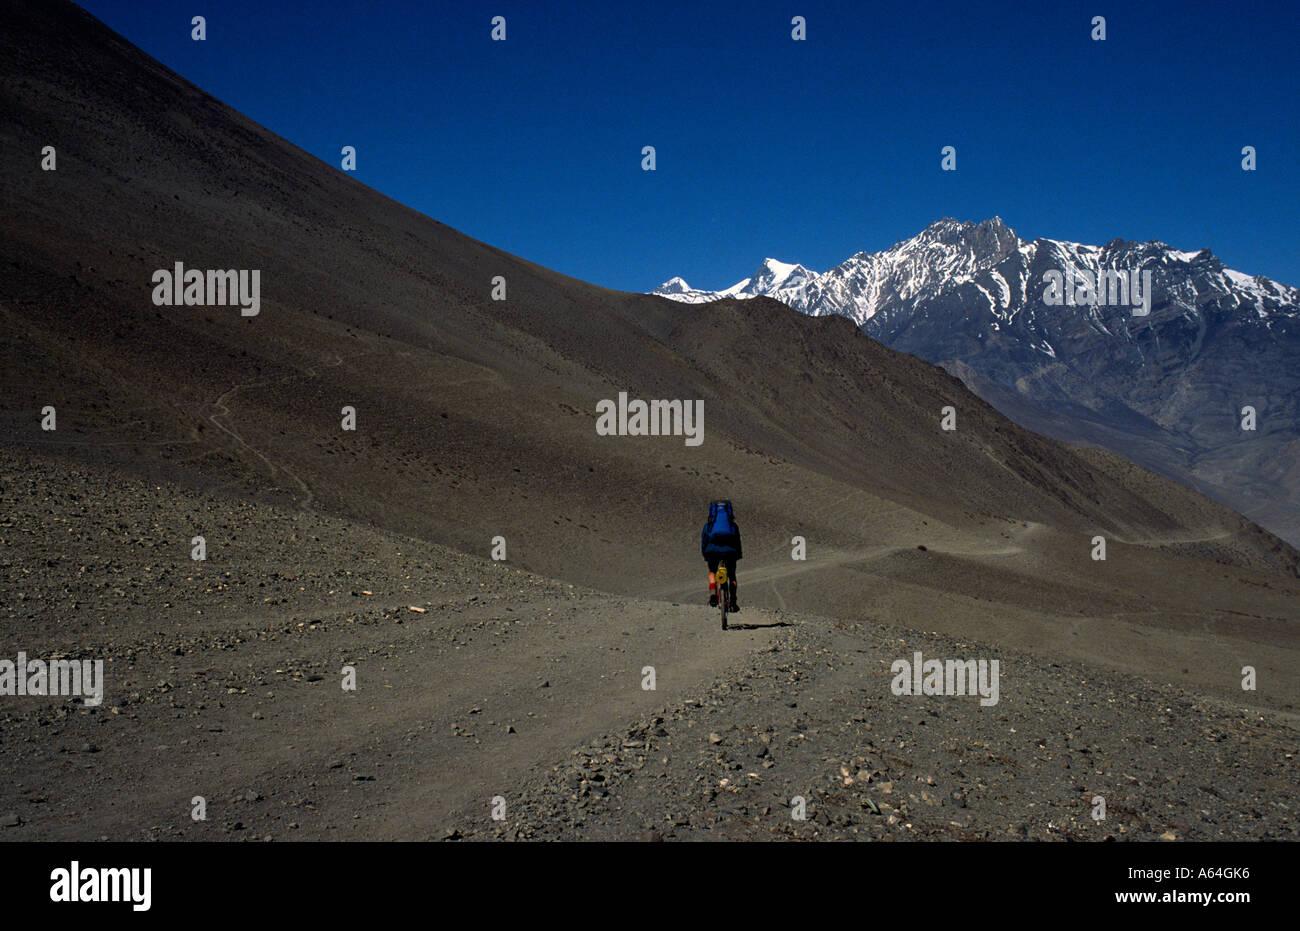 PICTURE CREDIT DOUG BLANE Doug Blane mountain biking around the Annapurna Circuit in the Himalayan Kingdom of Nepal Stock Photo